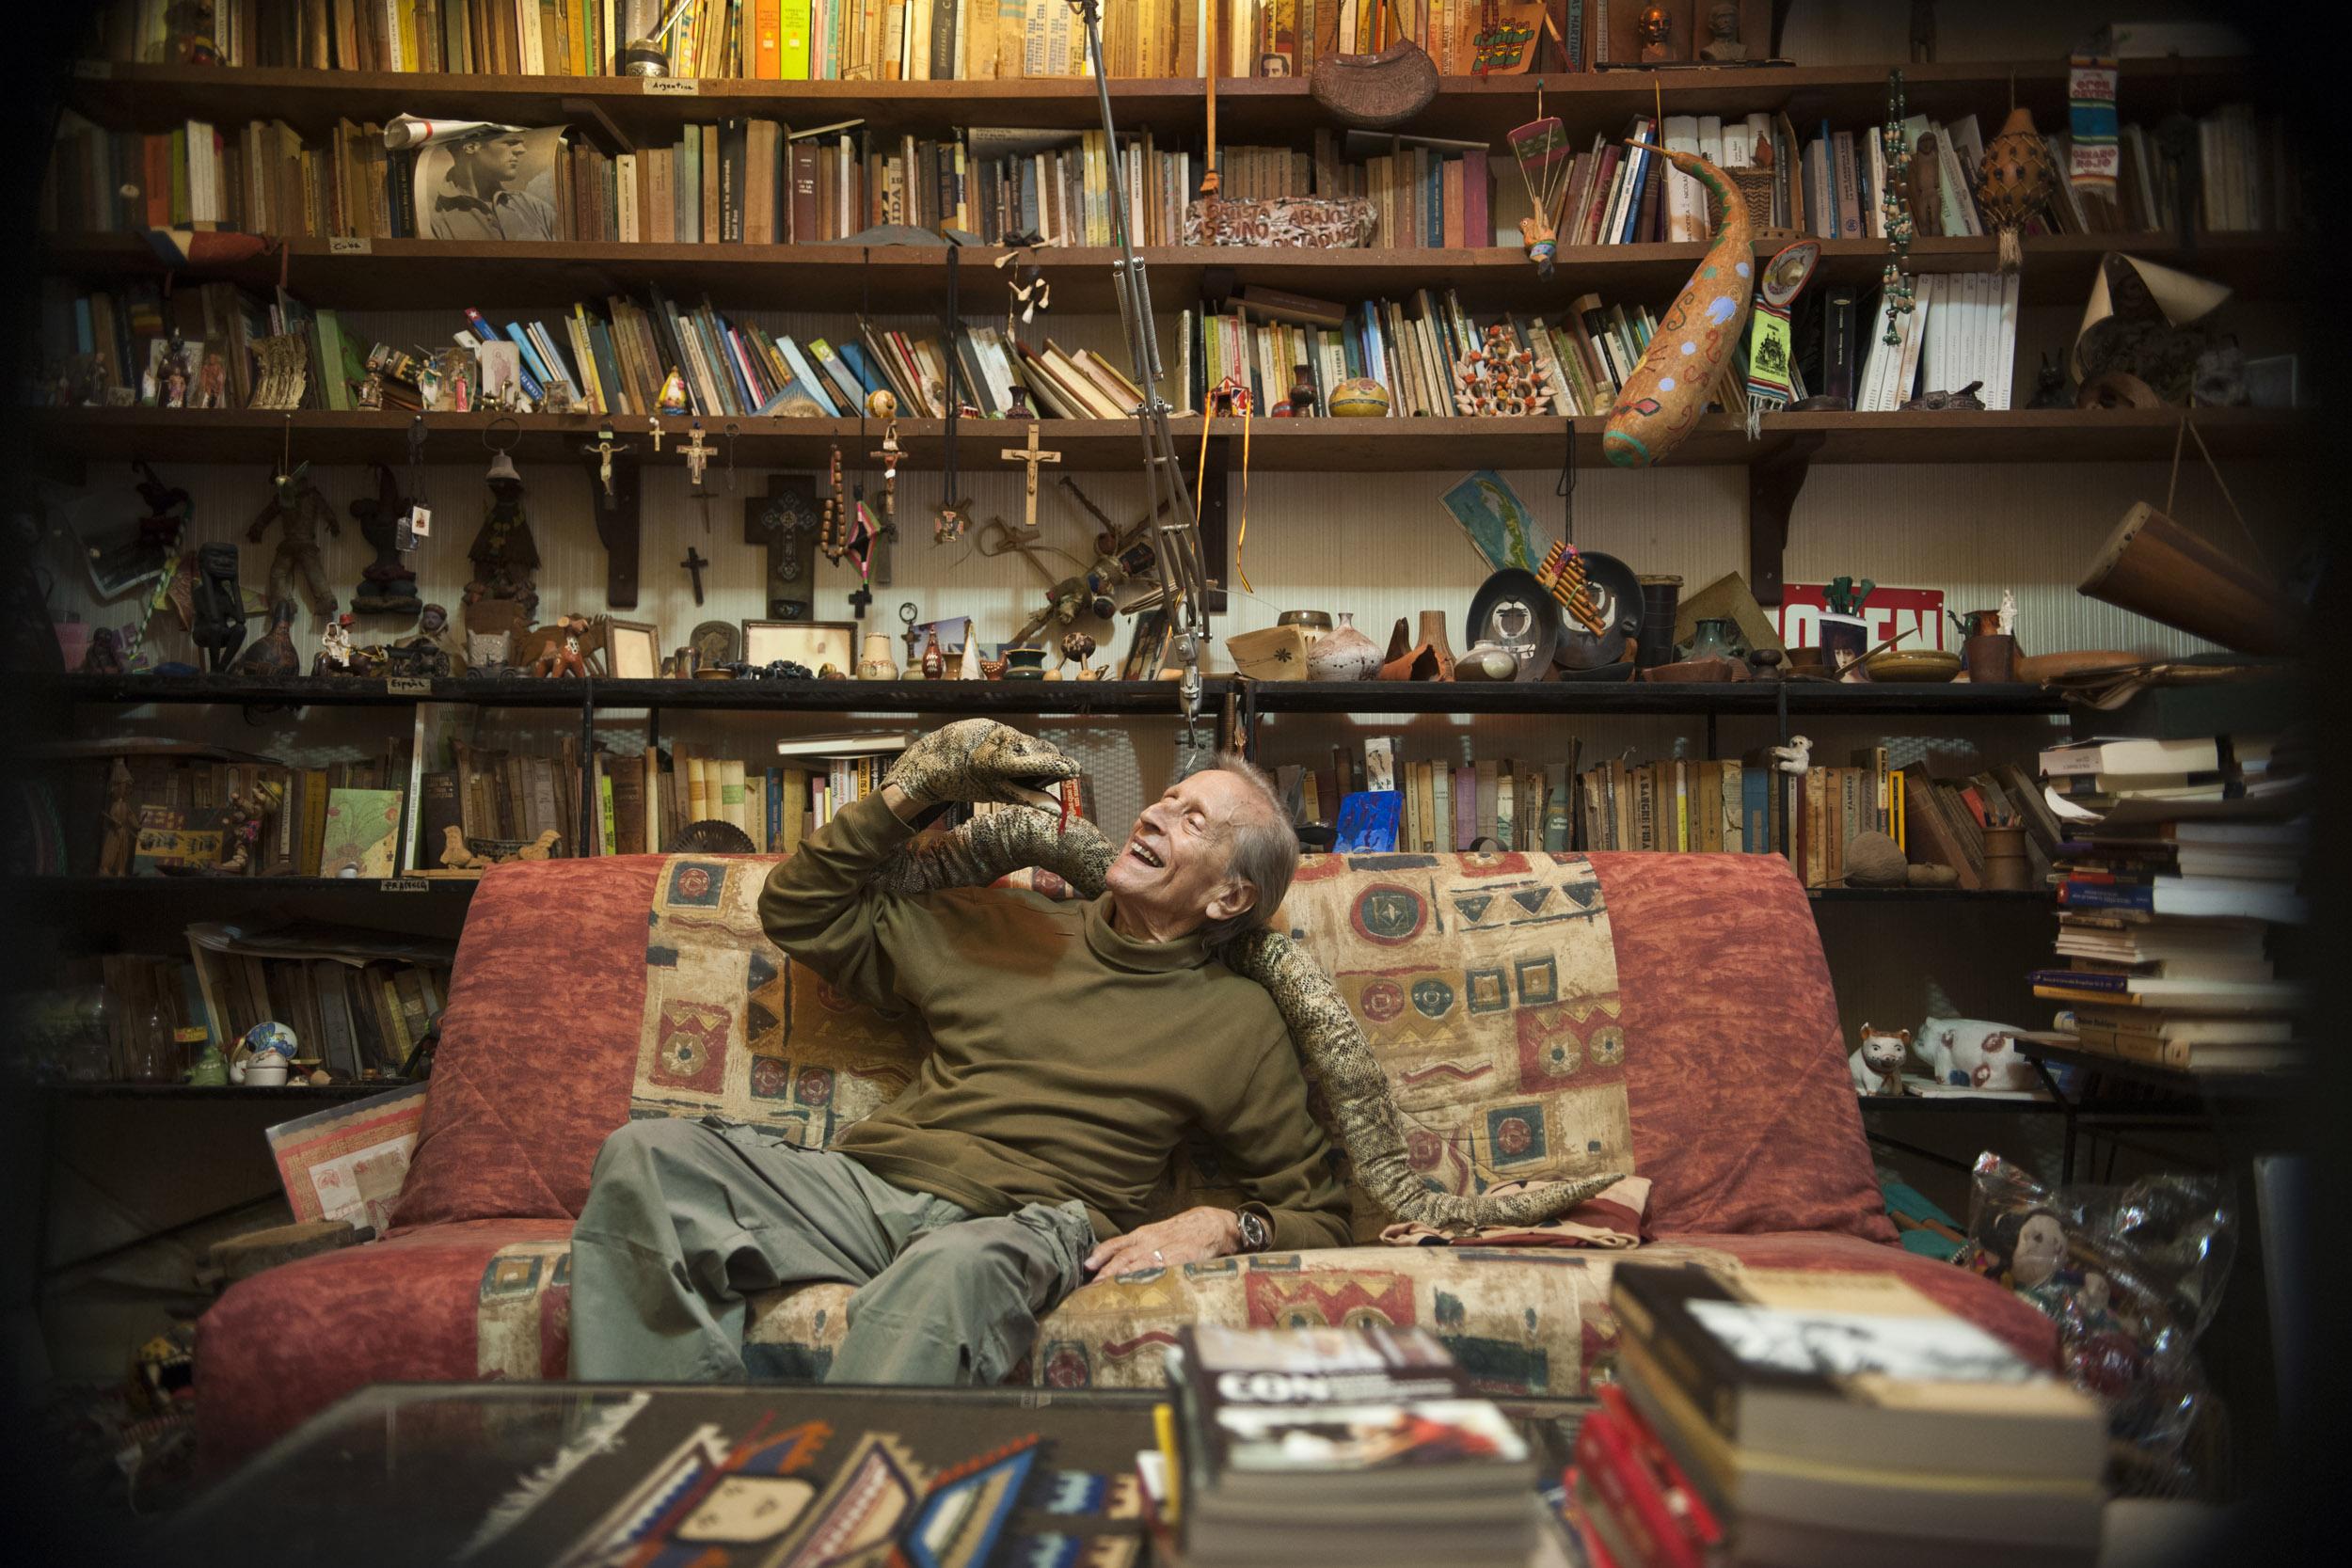 Enrique Pineda Barnet, filmmaker - Illuminated Cuba - Hector Garrido, Aerial and human photography